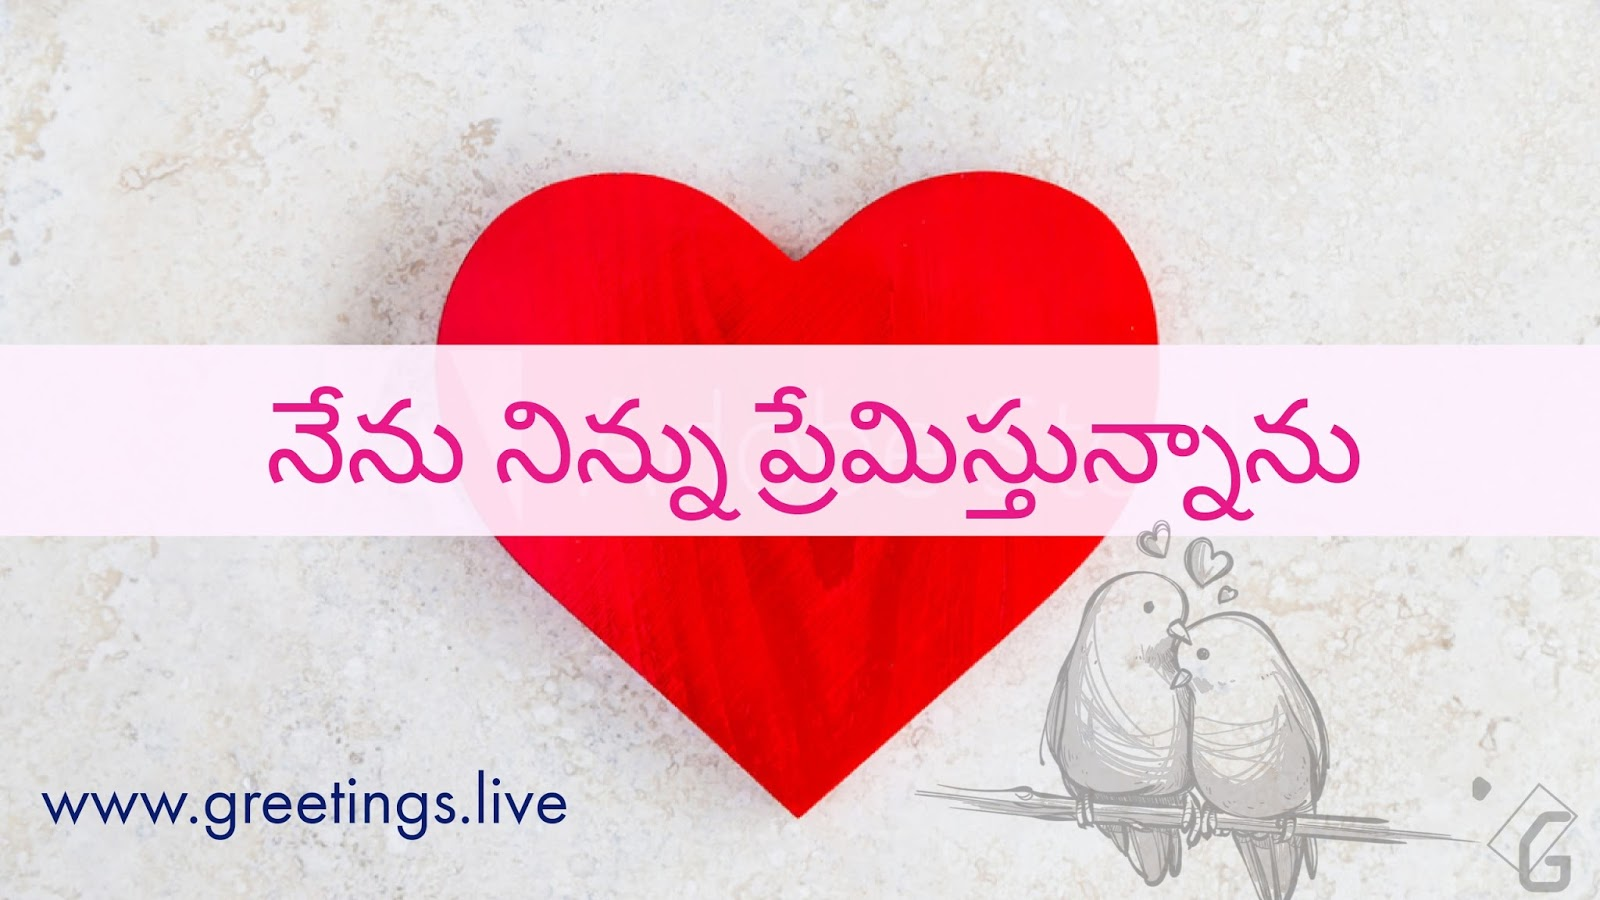 Greetingsve hd images love smile birthday wishes free download telugu script nenu ninnu premisthunanu kristyandbryce Image collections